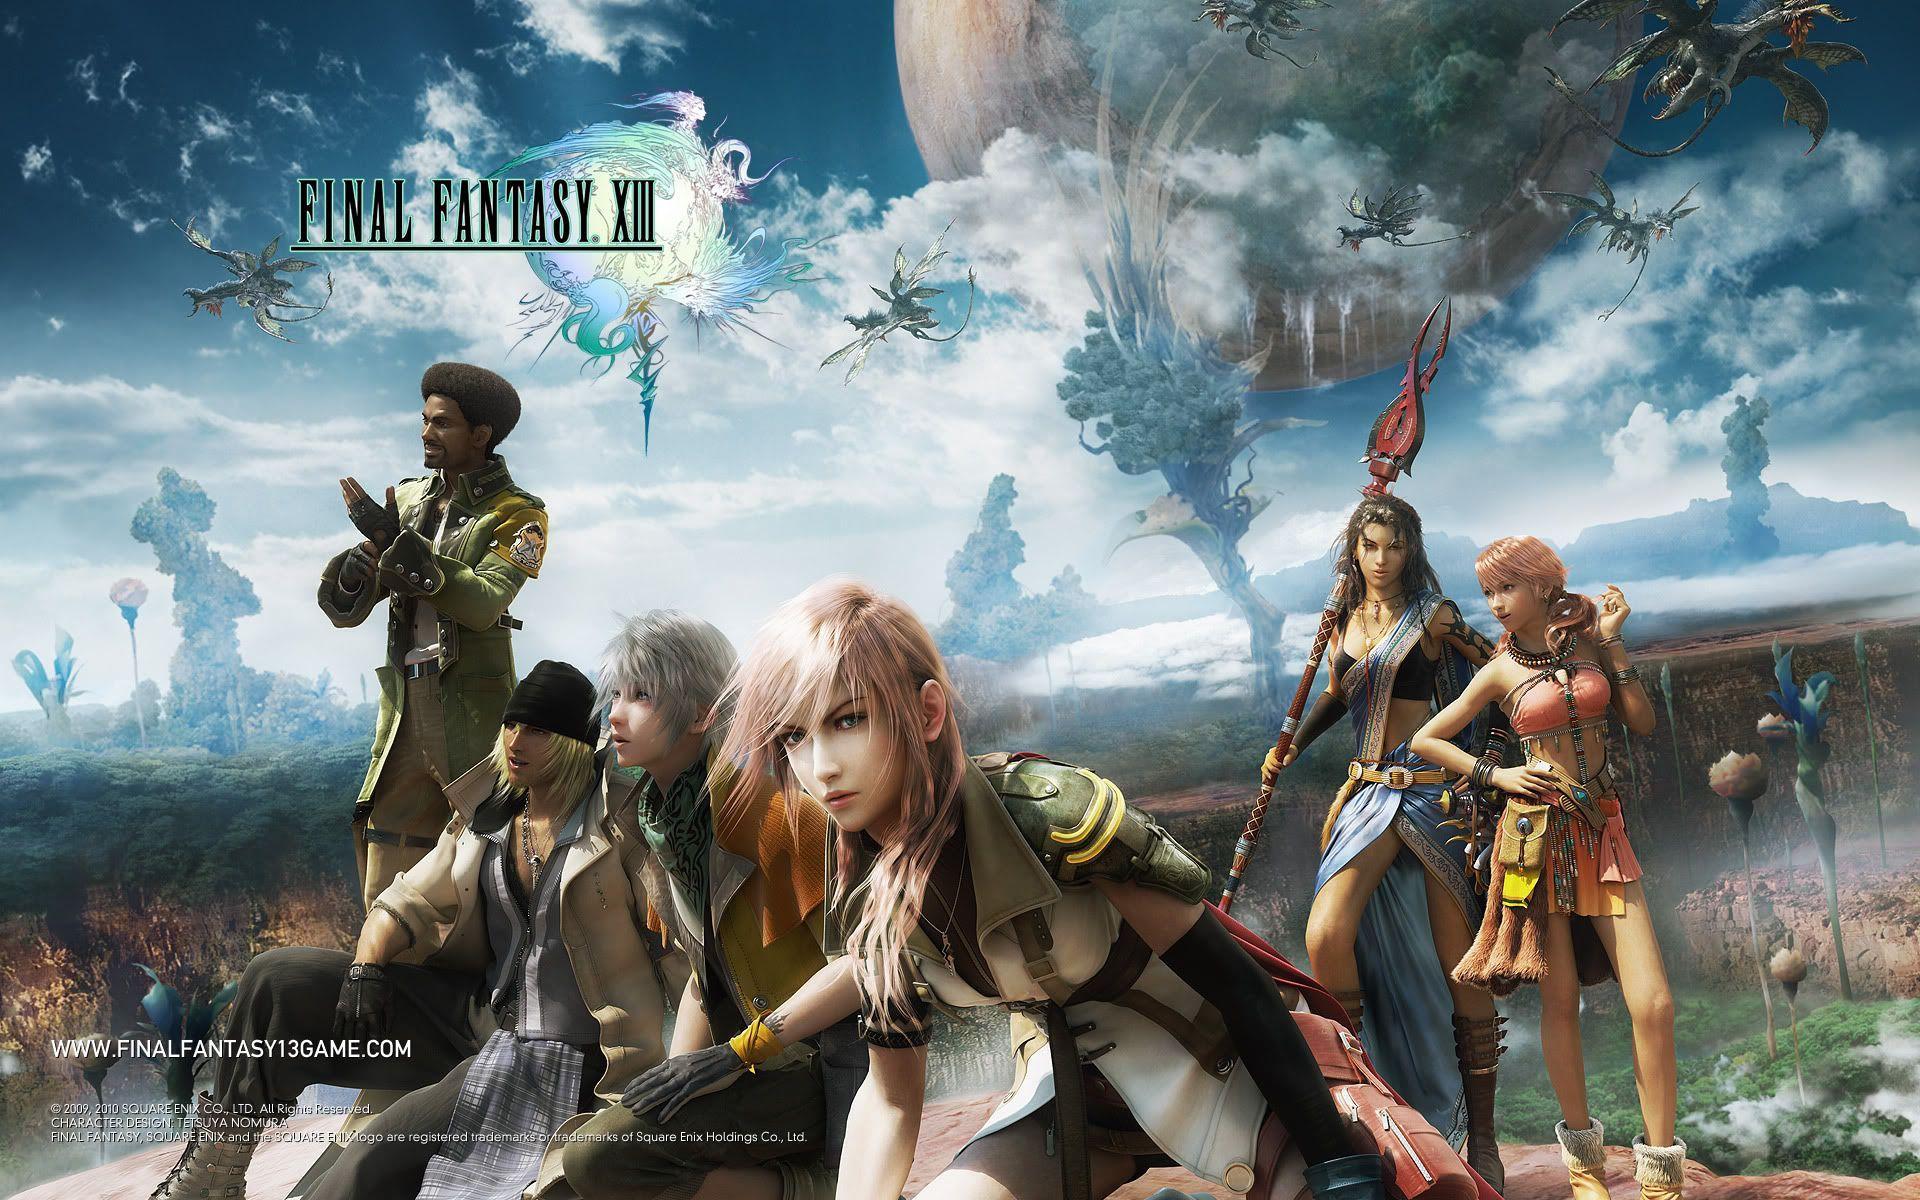 Final Fantasy 13 Wallpapers HD - Wallpaper Cave